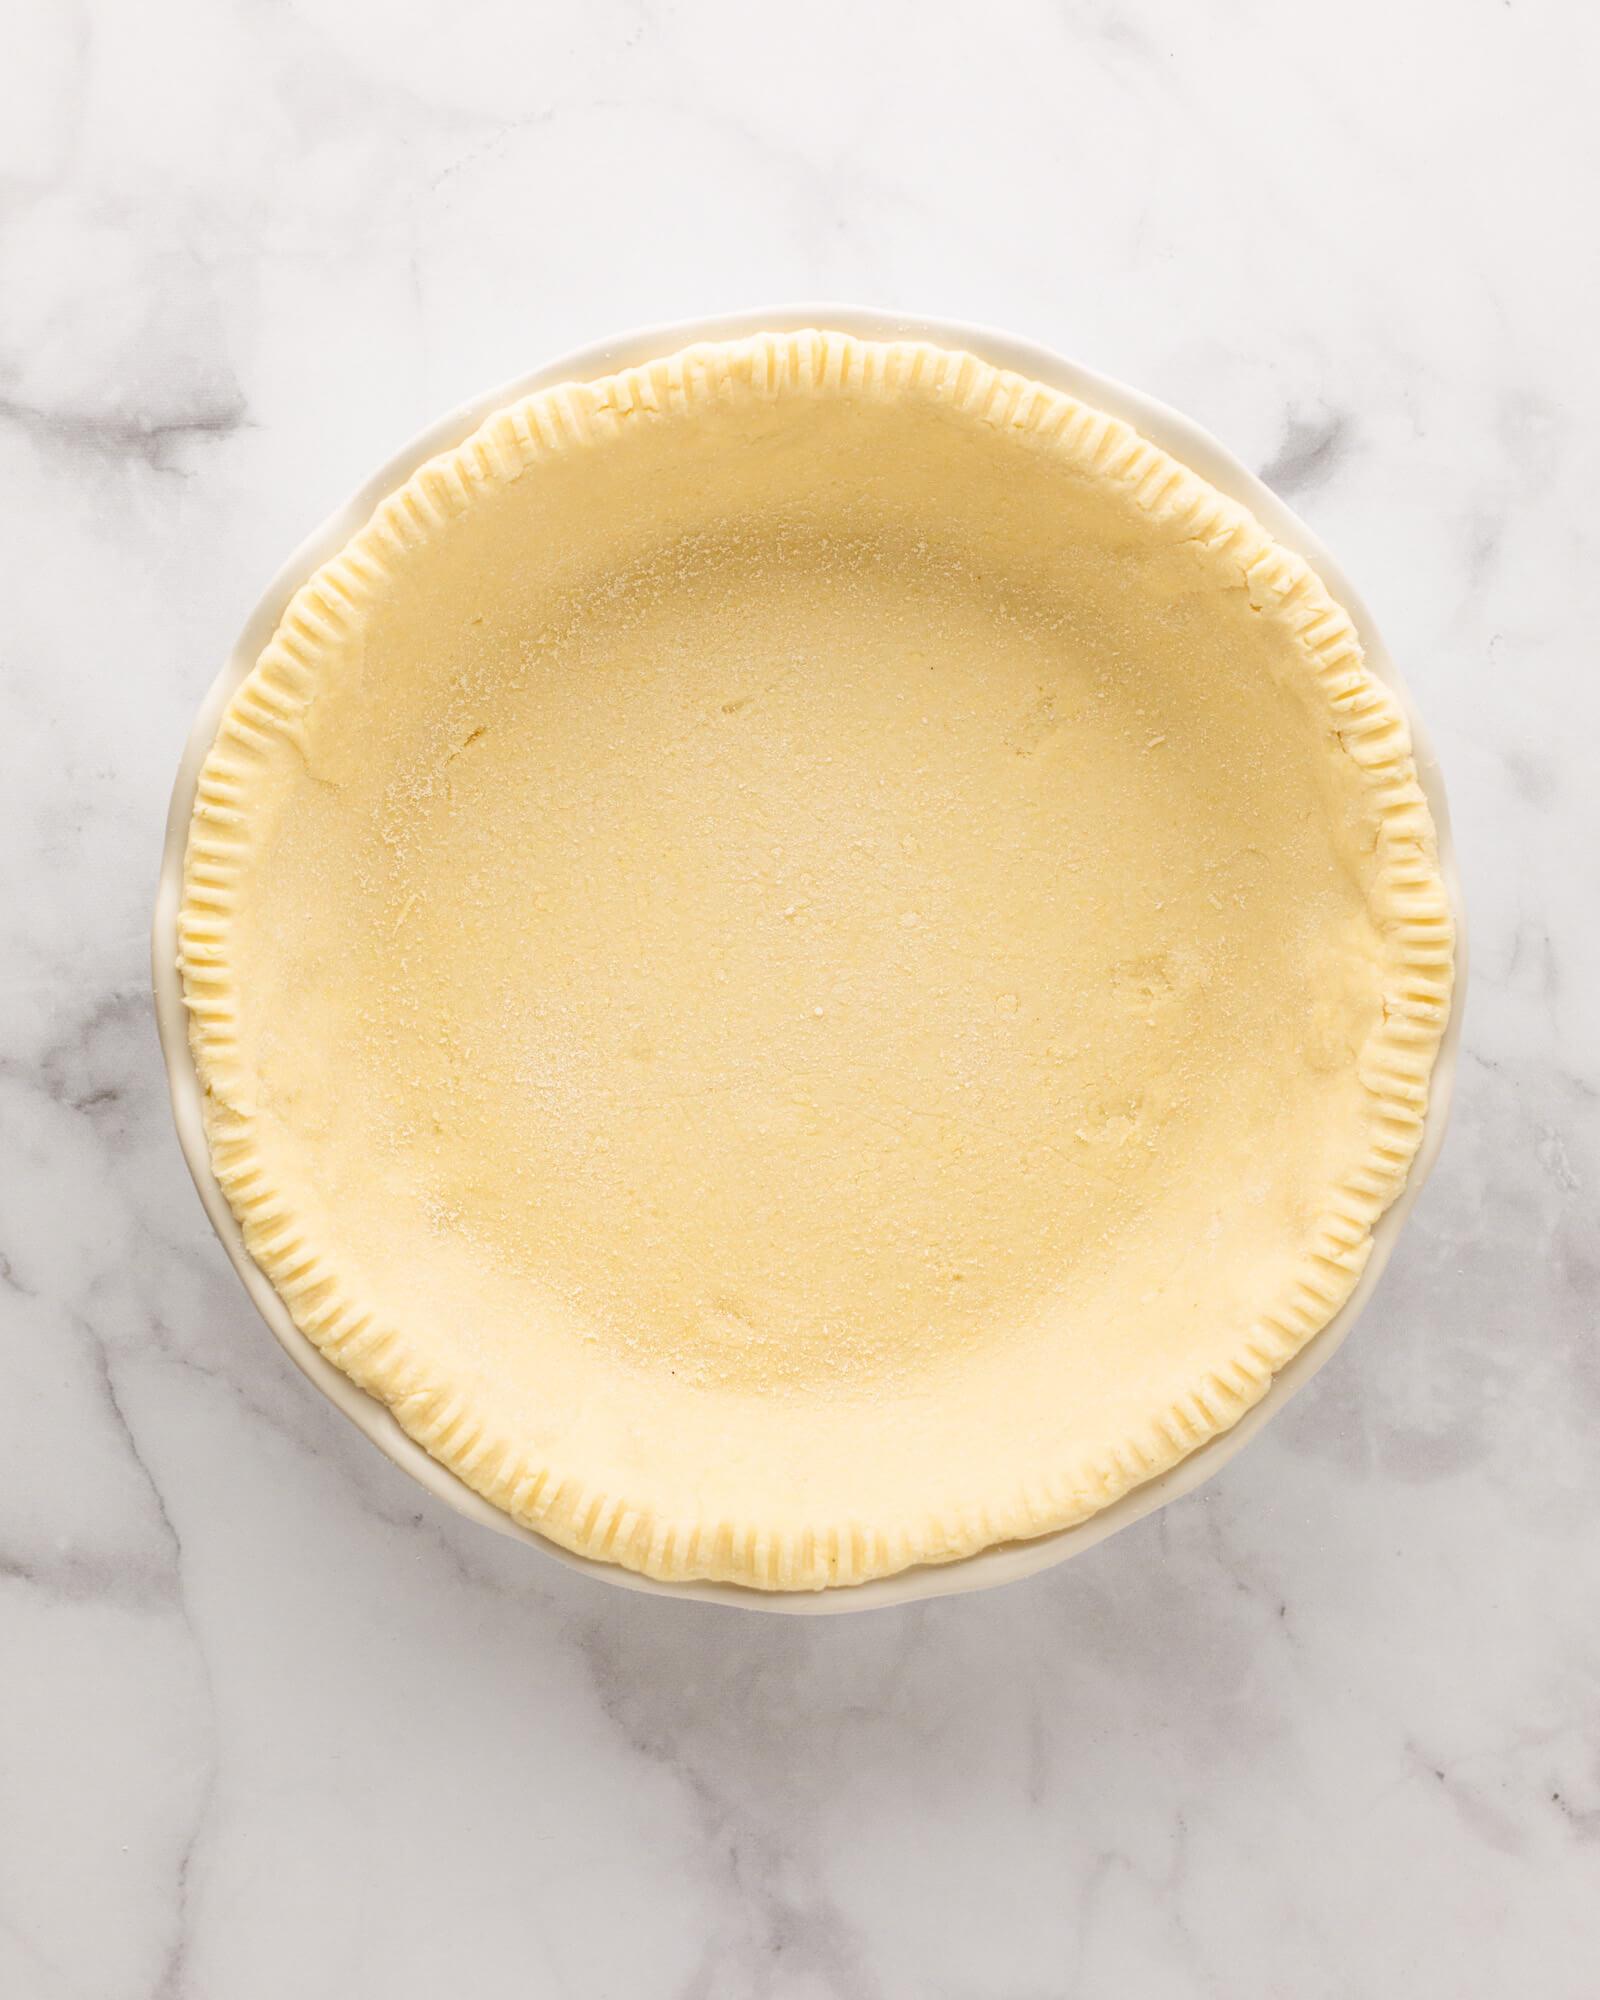 Keto Coconut Flour Pie Crust